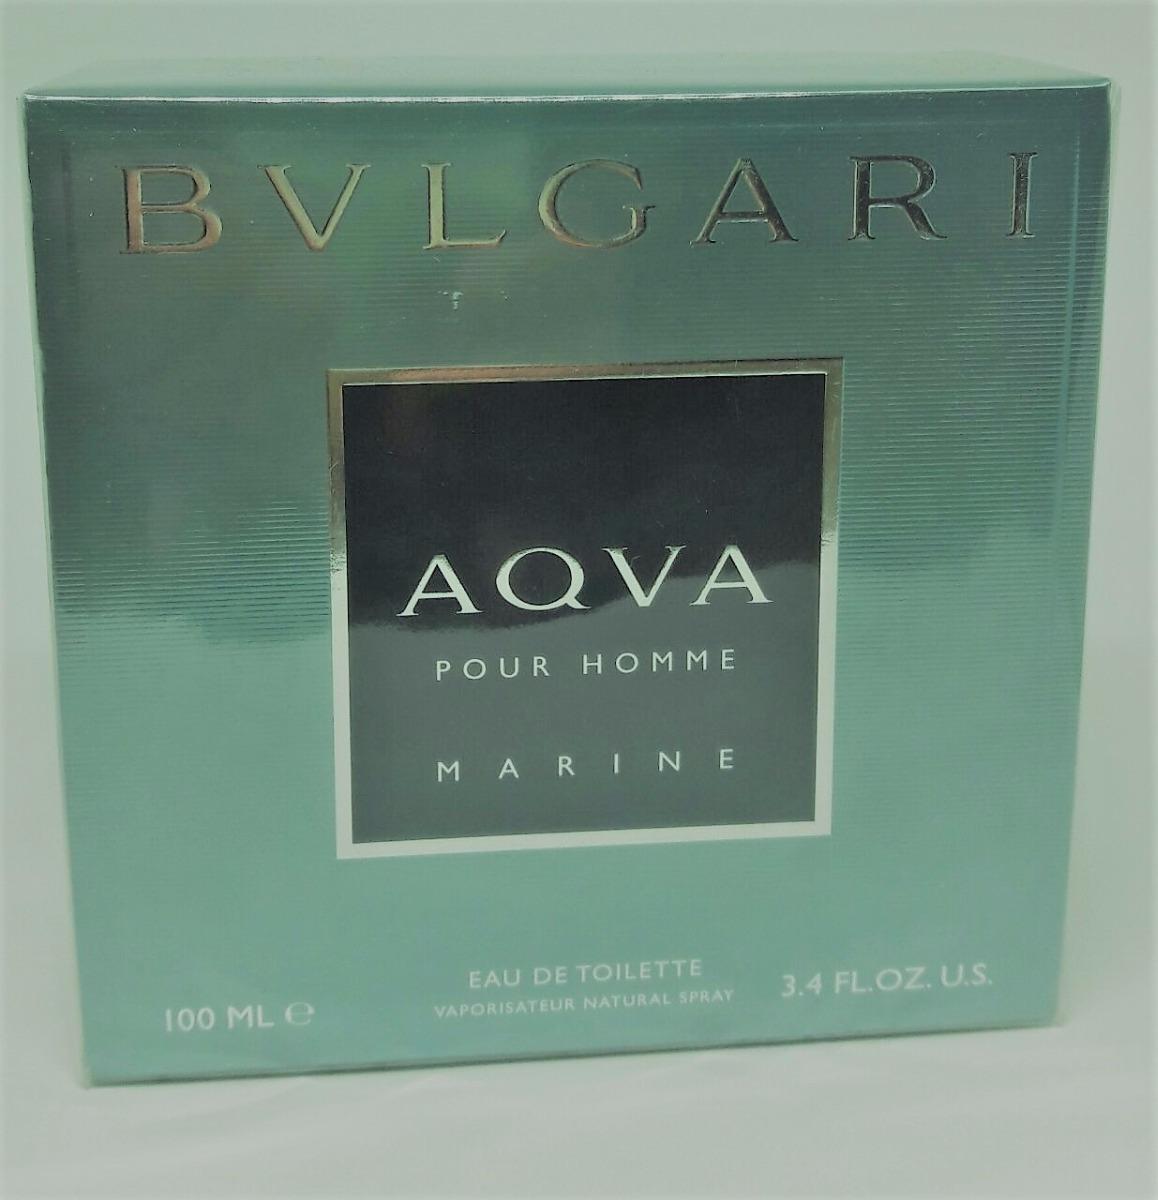 fe36281a1cc Perfume Bvlgari Aqva Marine 100ml Edt Original Frete Grátis. - R  237